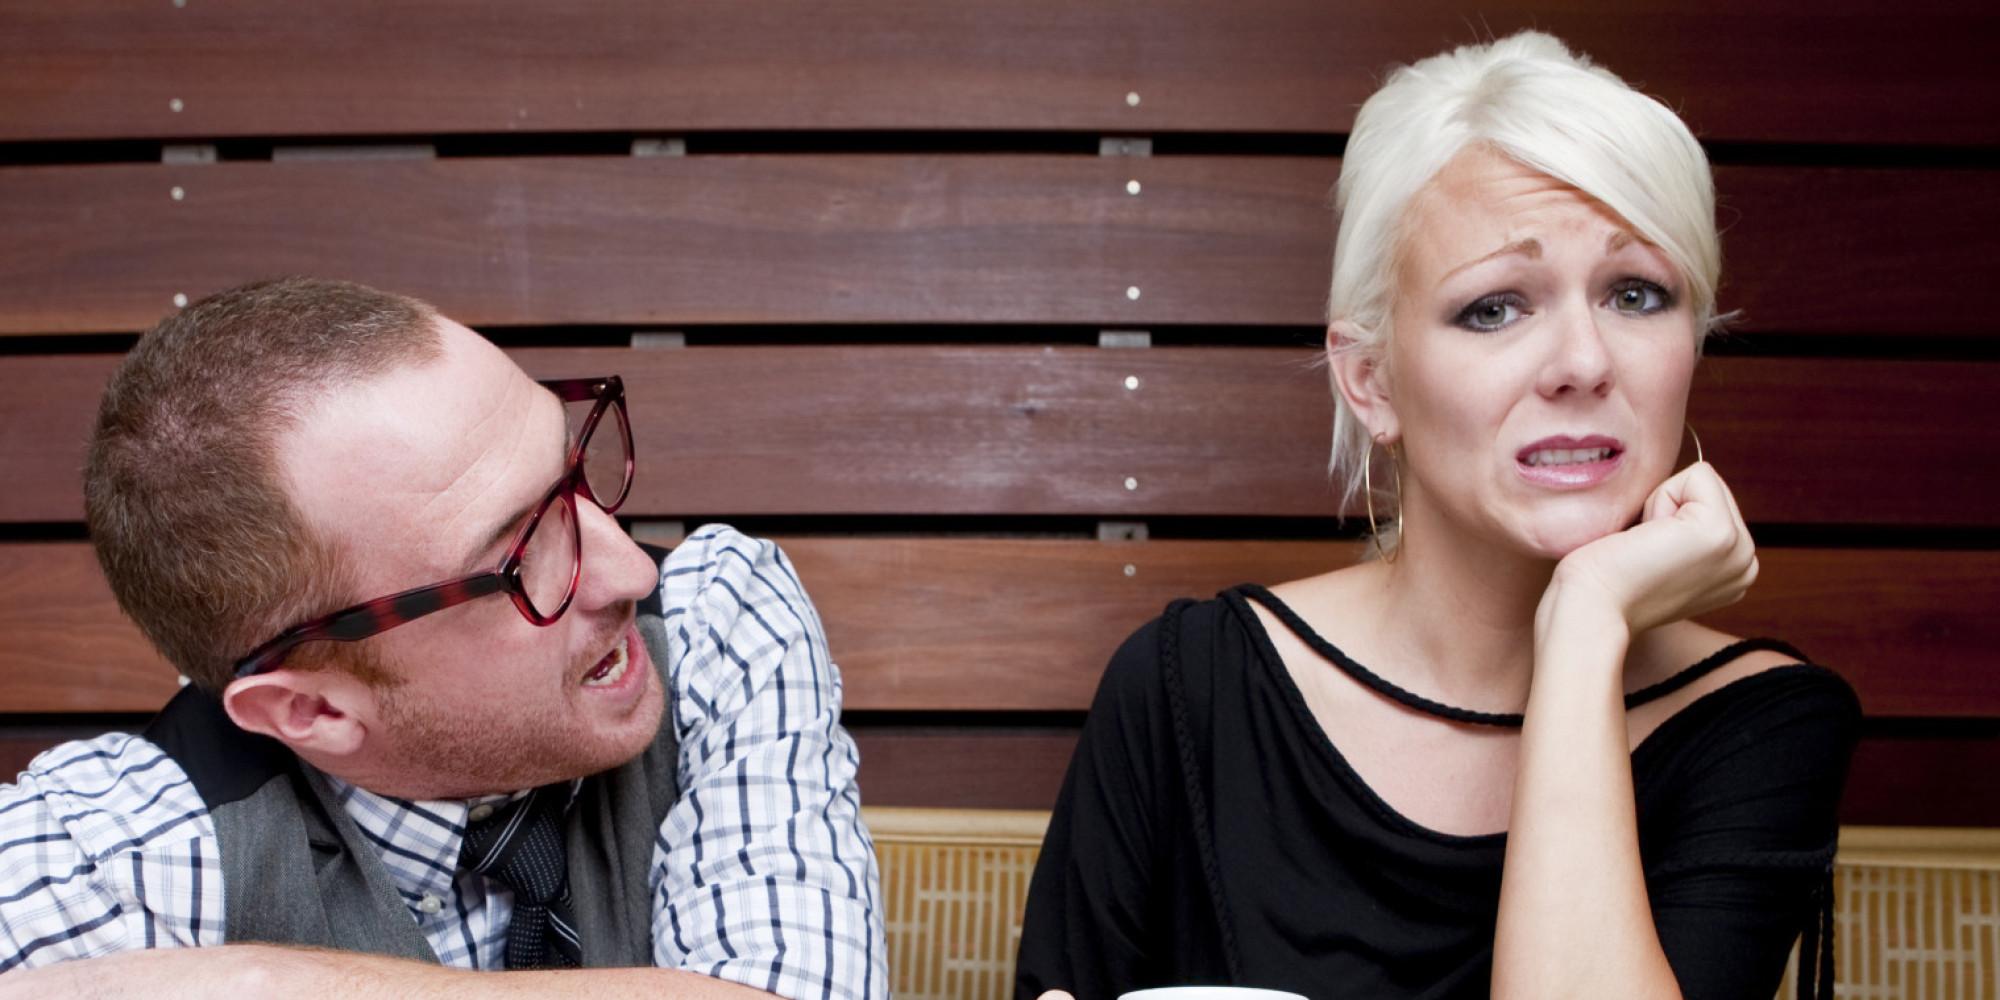 Bad koenigshofen black dating site